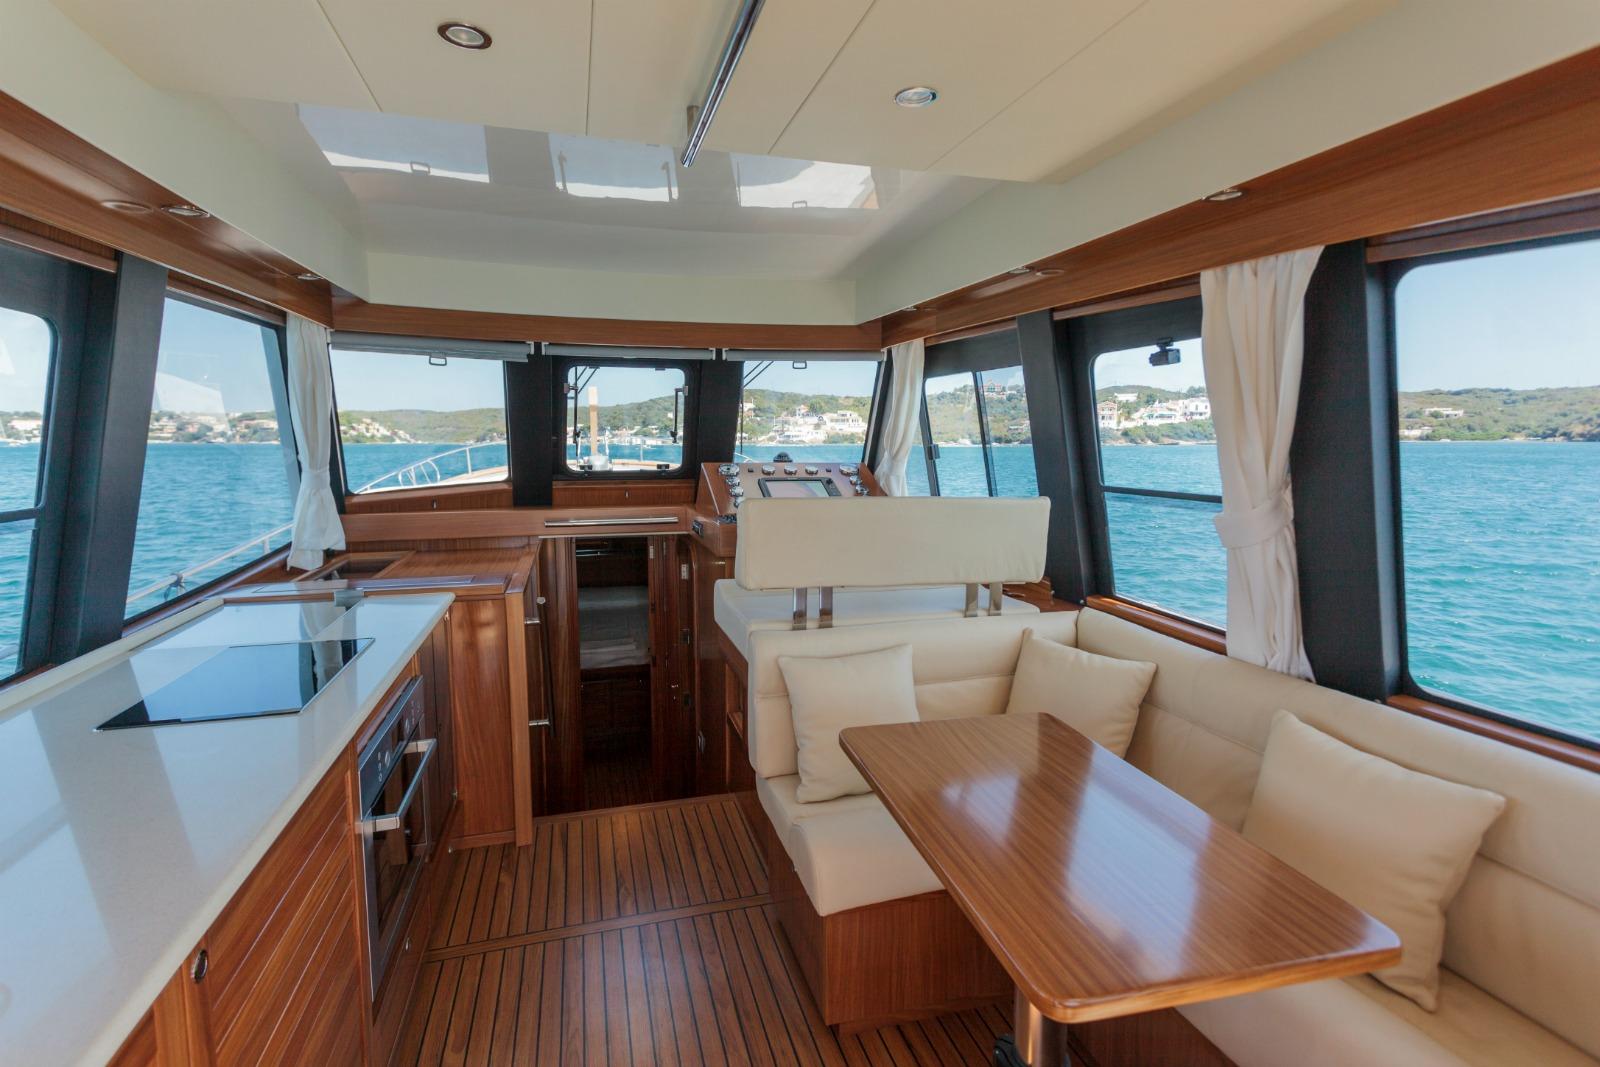 Minorca Islander 42 flybridge yacht for sale - Interior